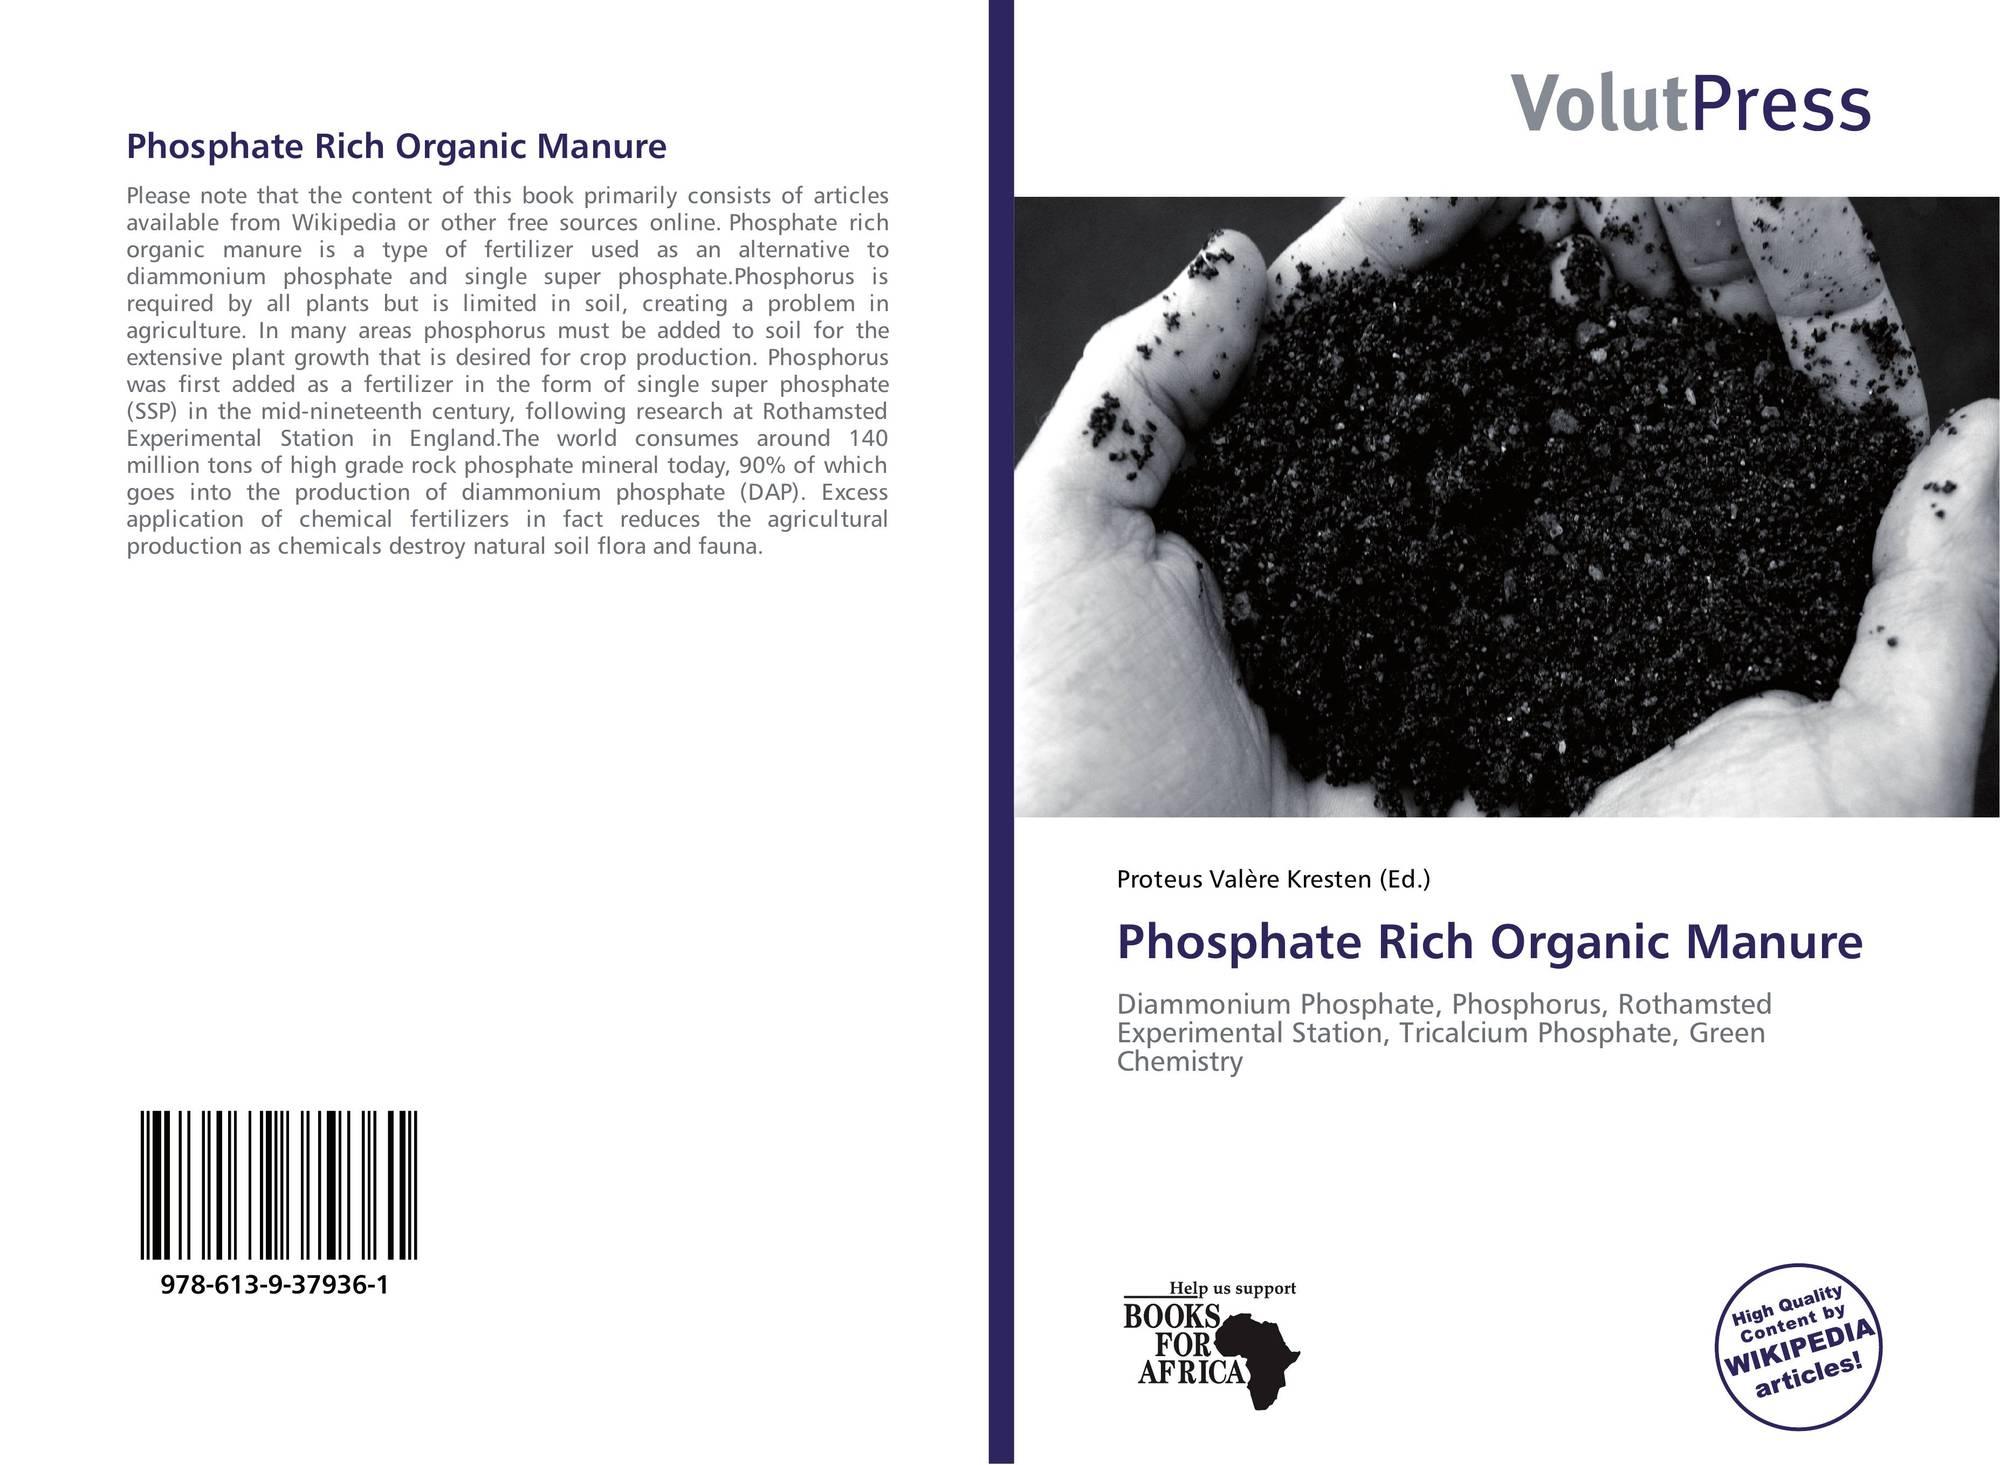 Phosphate green chemistry chemistry volutpress 2011 12 24 isbn